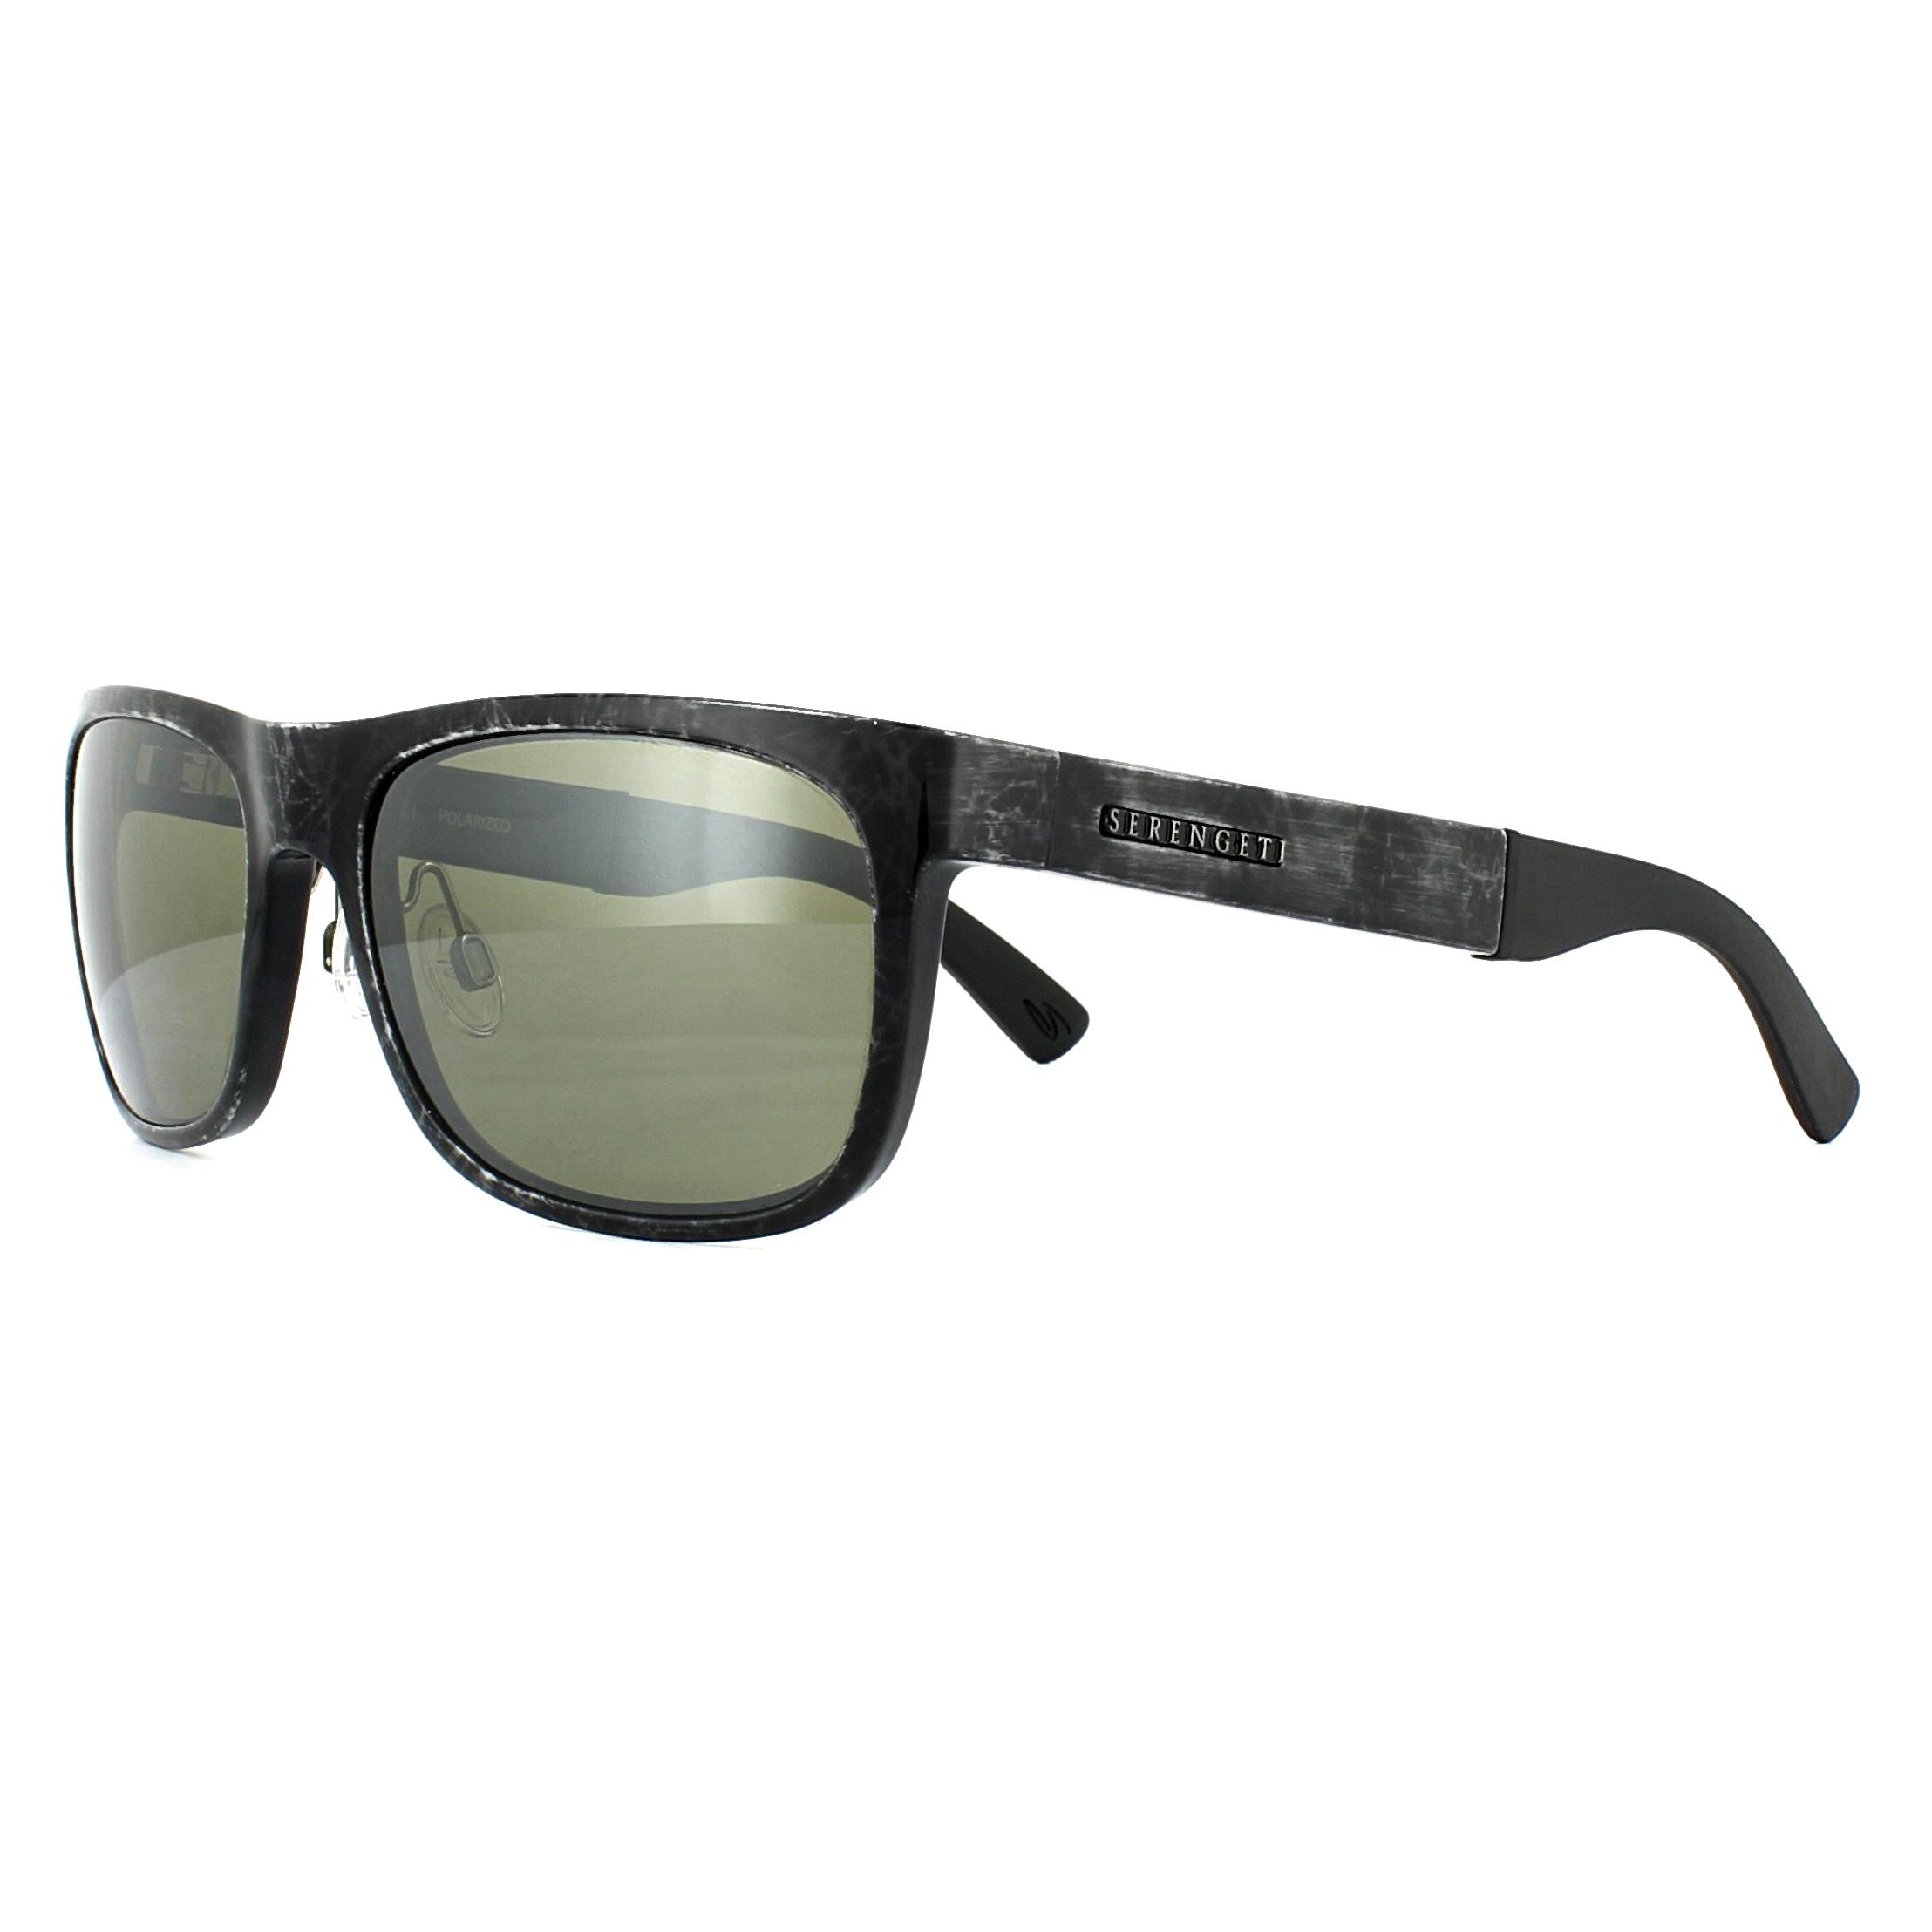 7bfa44247afa Sentinel Serengeti Sunglasses Nico 7647 Shiny Grey Marble 555nm Green  Polarized